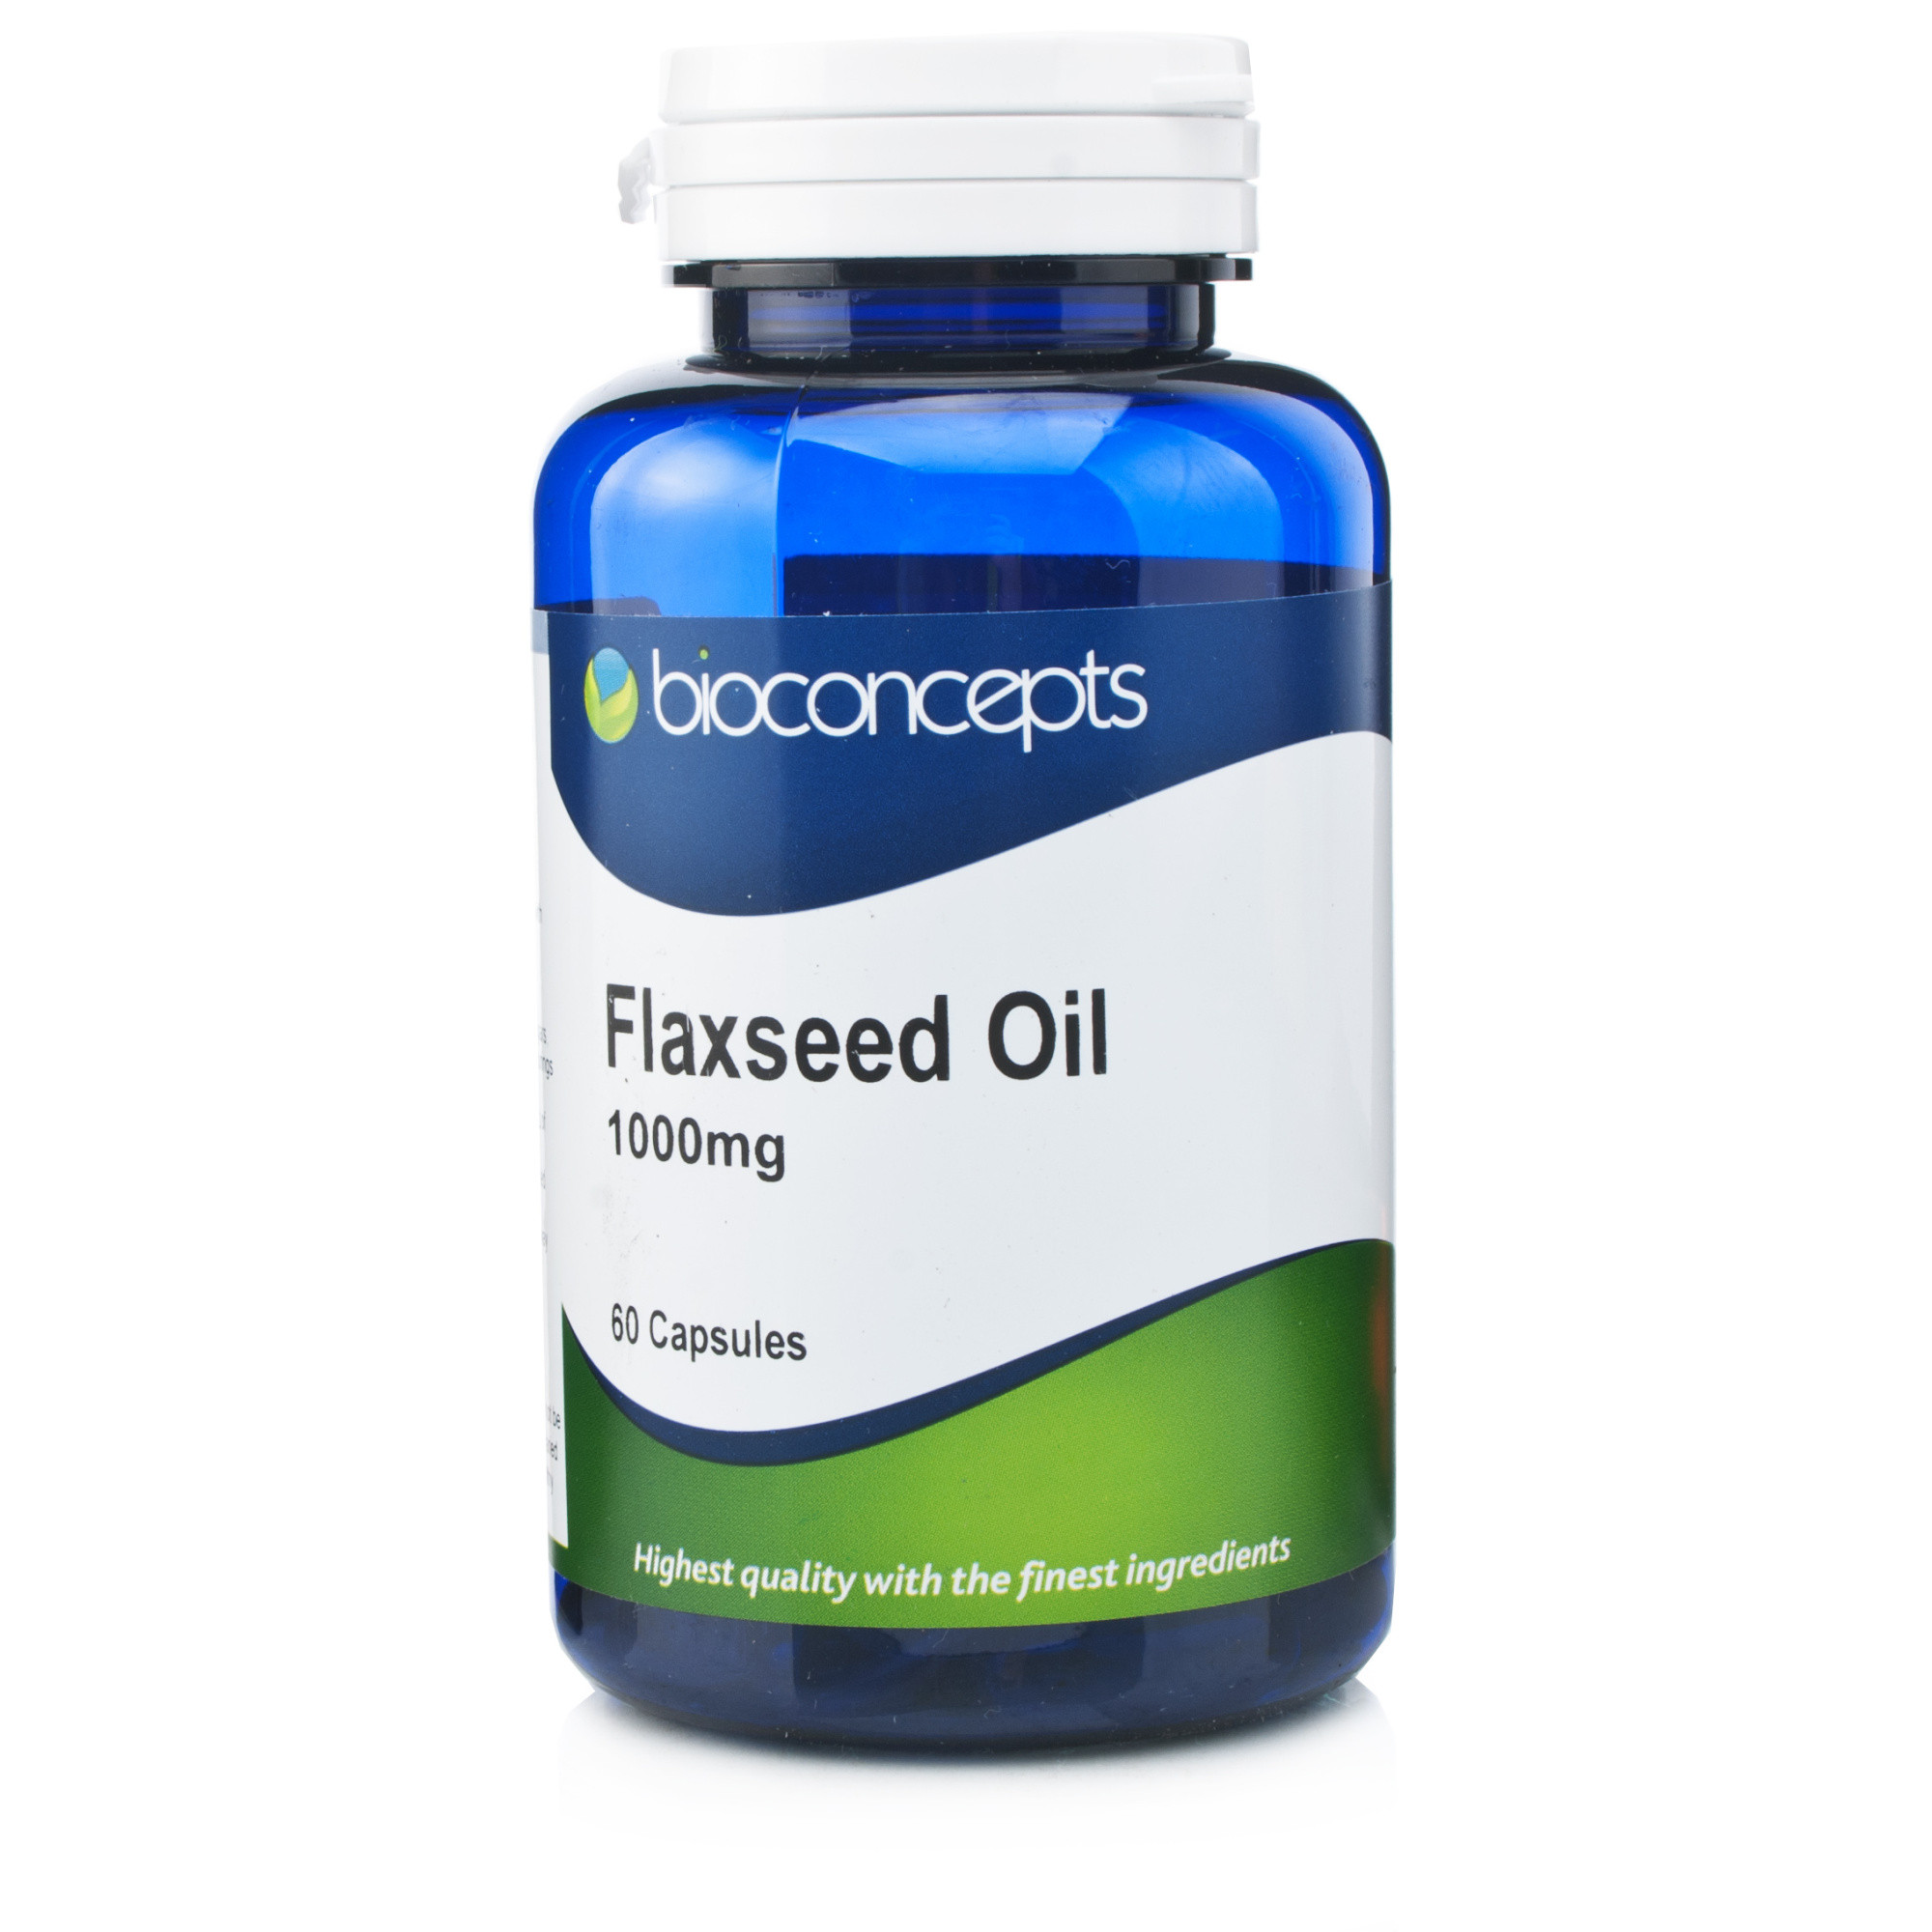 Bioconcepts Flaxseed Oil 1000mg 60 Capsules